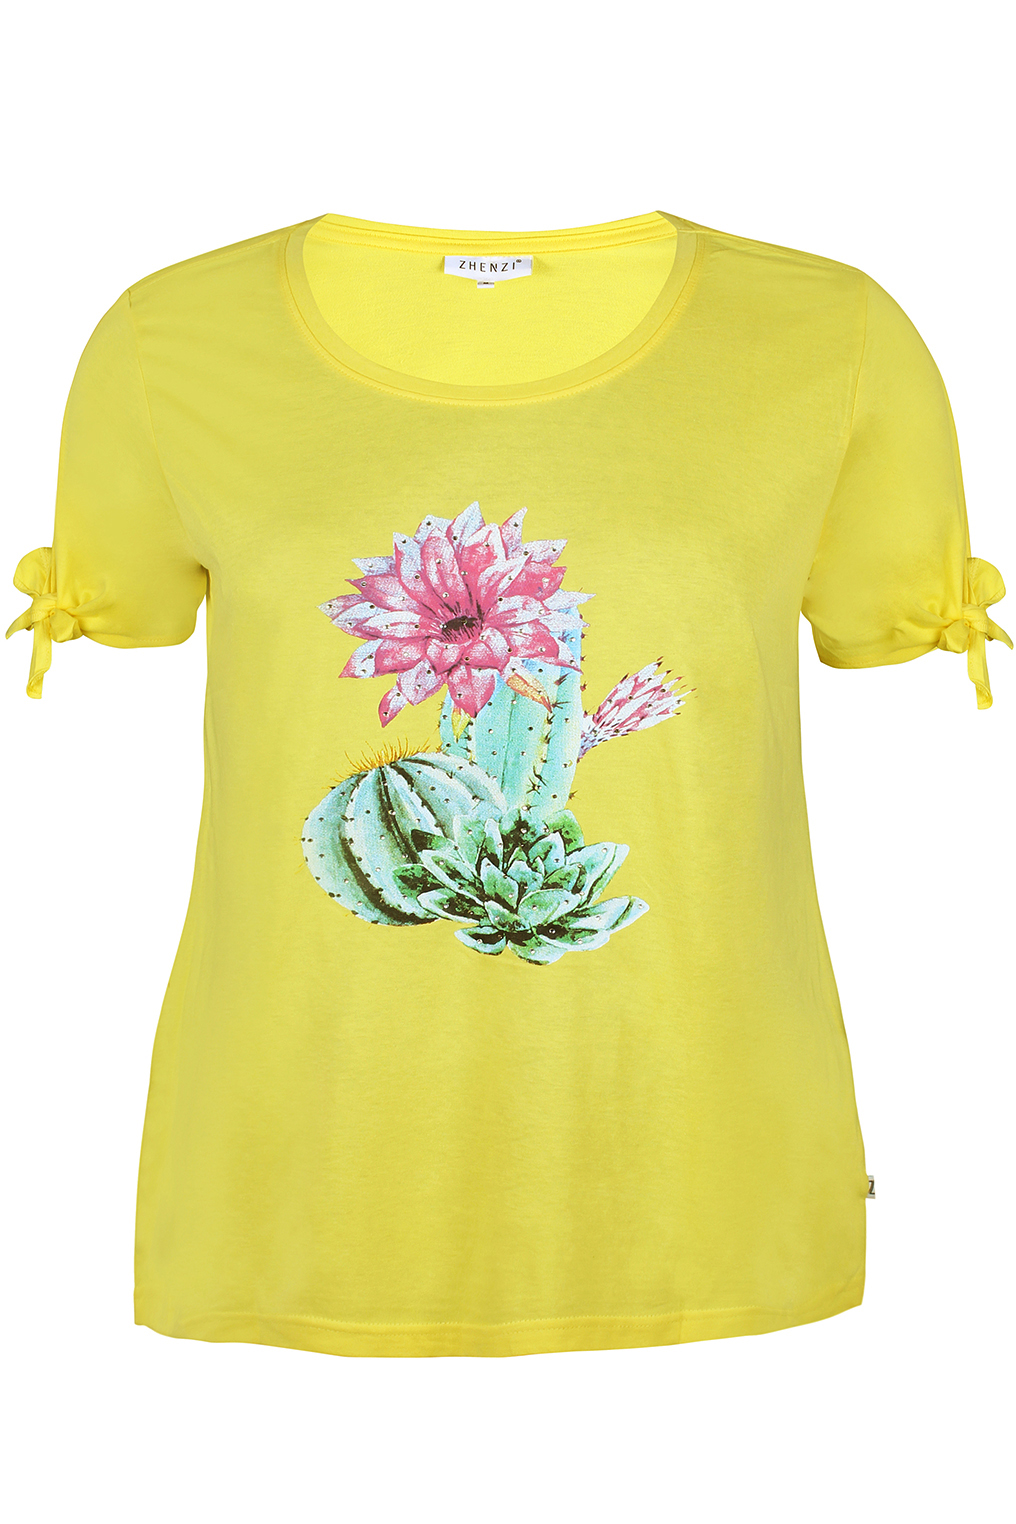 Shirt Zhenzi ALVILDE kaktus opdruk